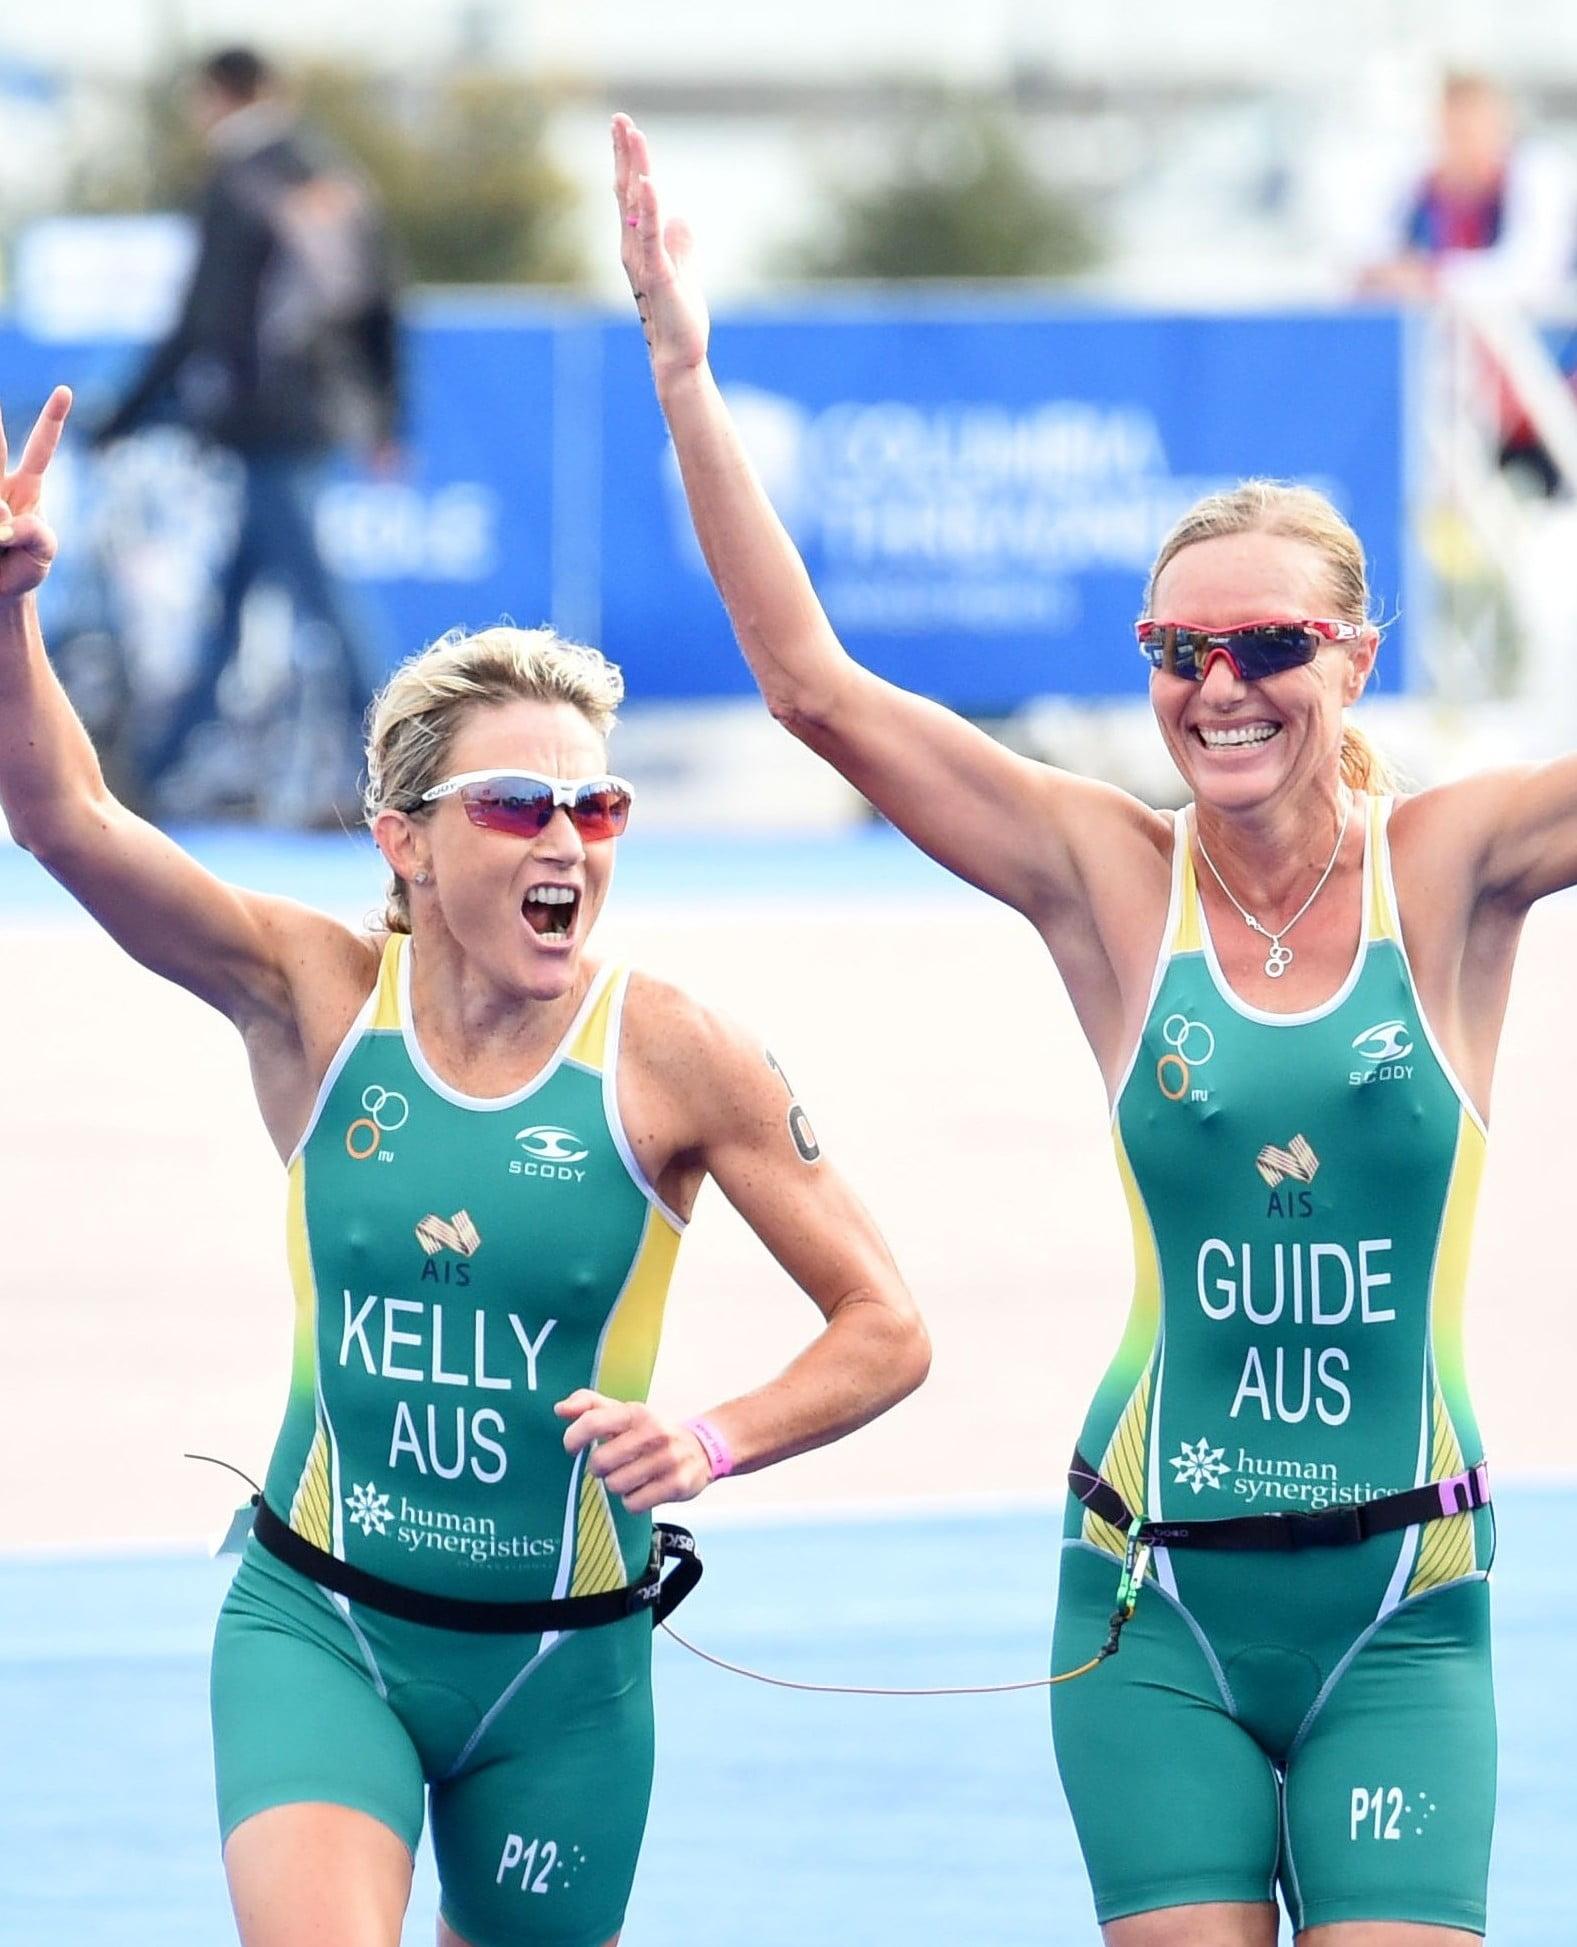 Women's Triathlon - Preview